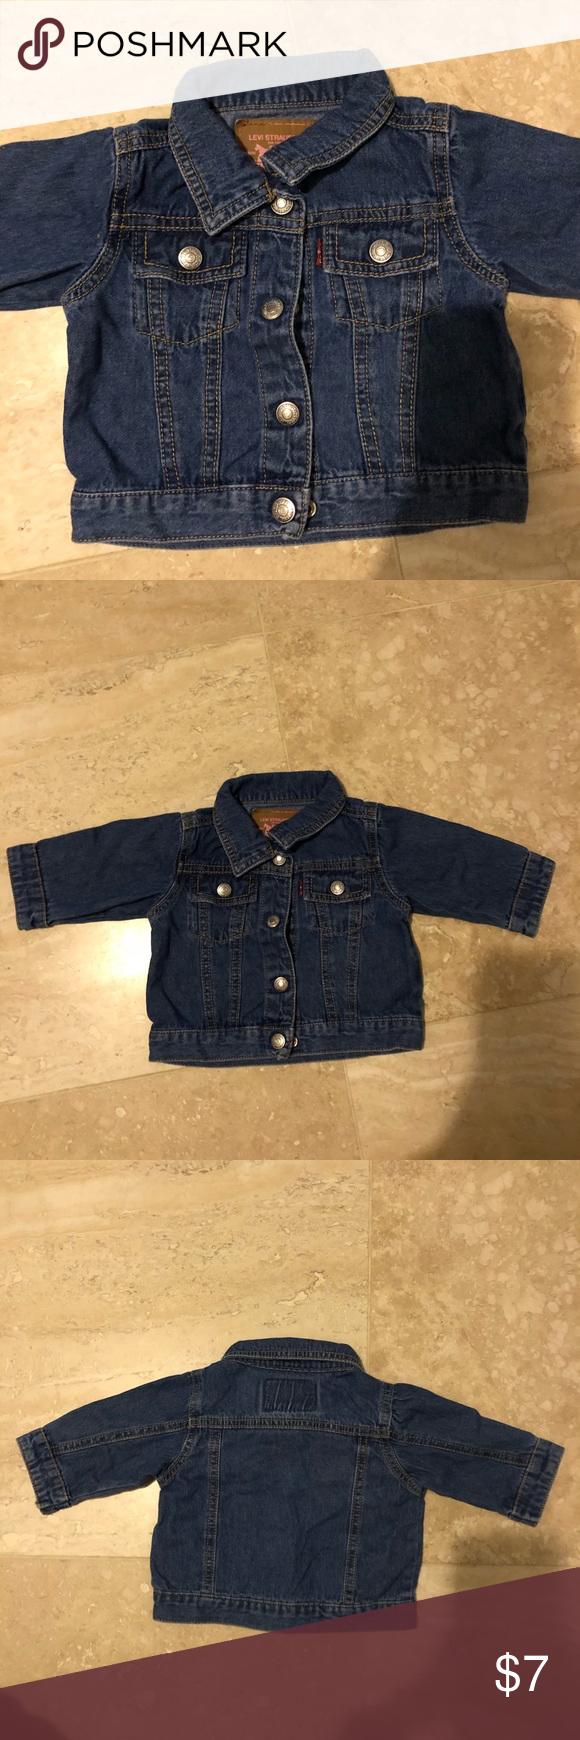 Levi S Baby Denim Jacket Levi S Denim Jacket Snap On Buttons Size 3 6 Months Light Weight Denim Great Quality 100 Co Baby Denim Jacket Denim Jacket Denim [ 1740 x 580 Pixel ]